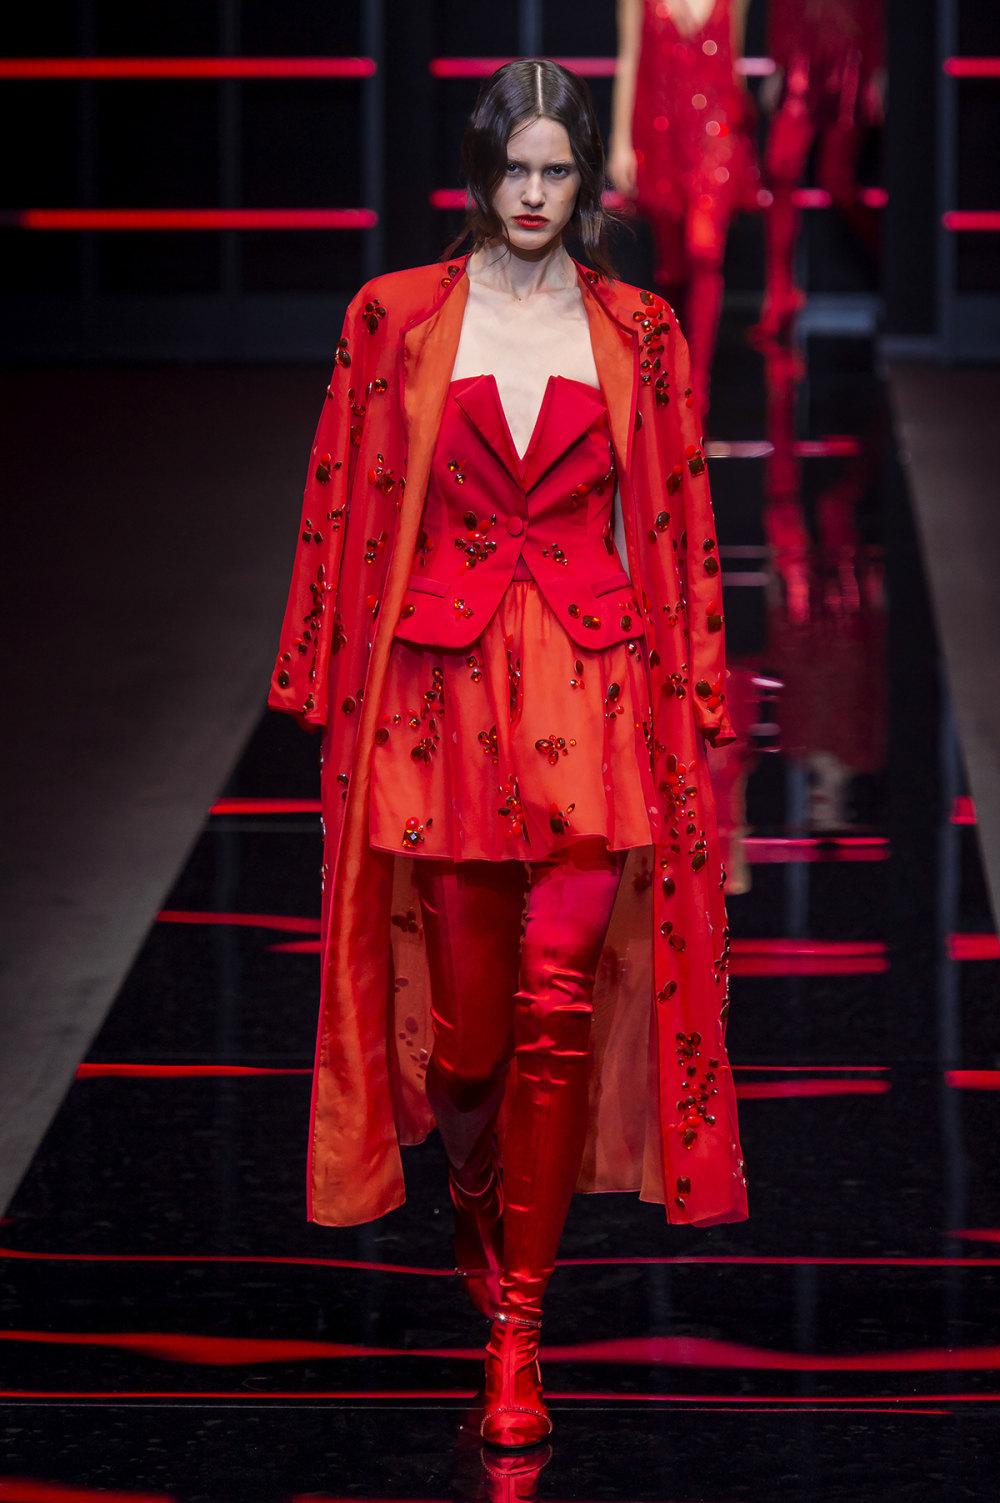 Emporio Armani时装系列畅的裤子带有柔滑裙子的鸡尾酒礼服-67.jpg